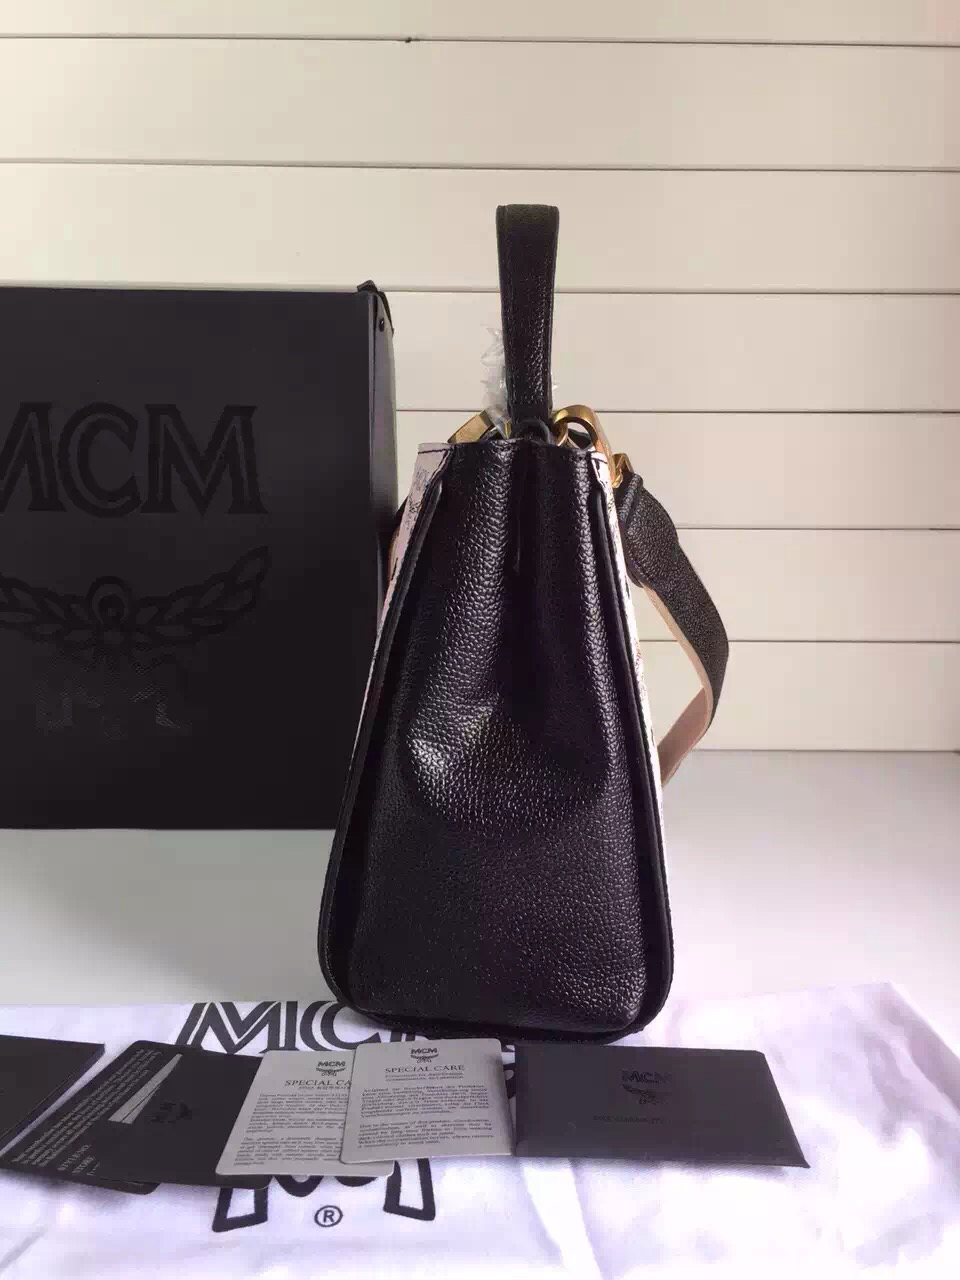 MCM专柜新款原单 LG进口PVC料配定制粒面牛皮 粉色拼黑